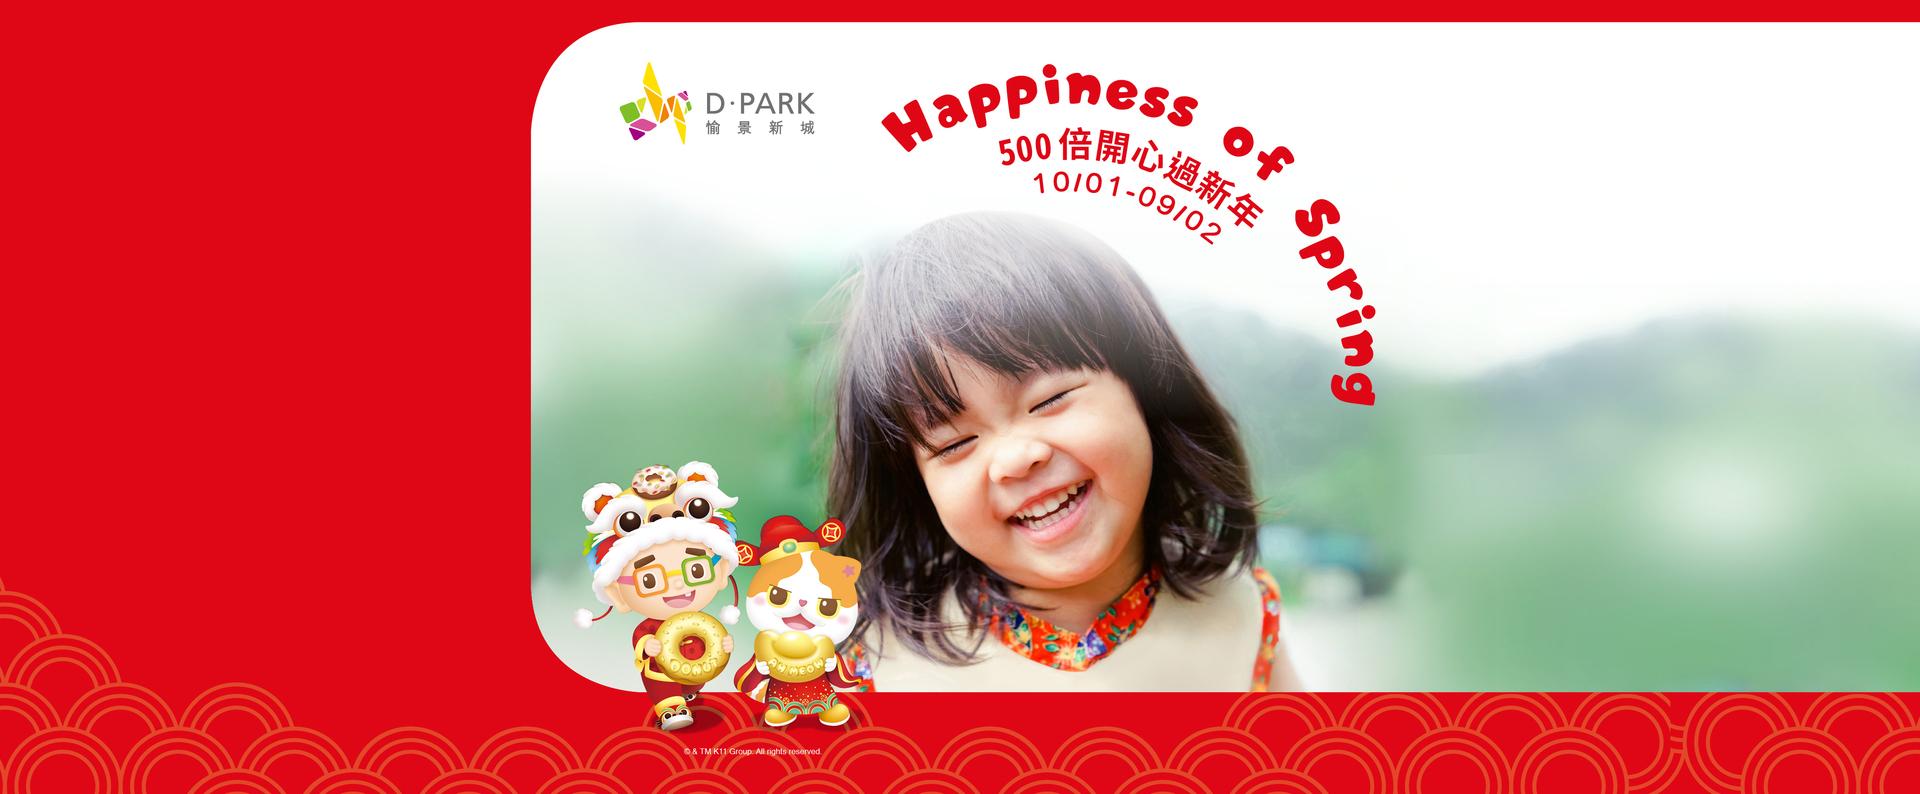 02 cny2020 webhead banner1920x794 %283%29 large